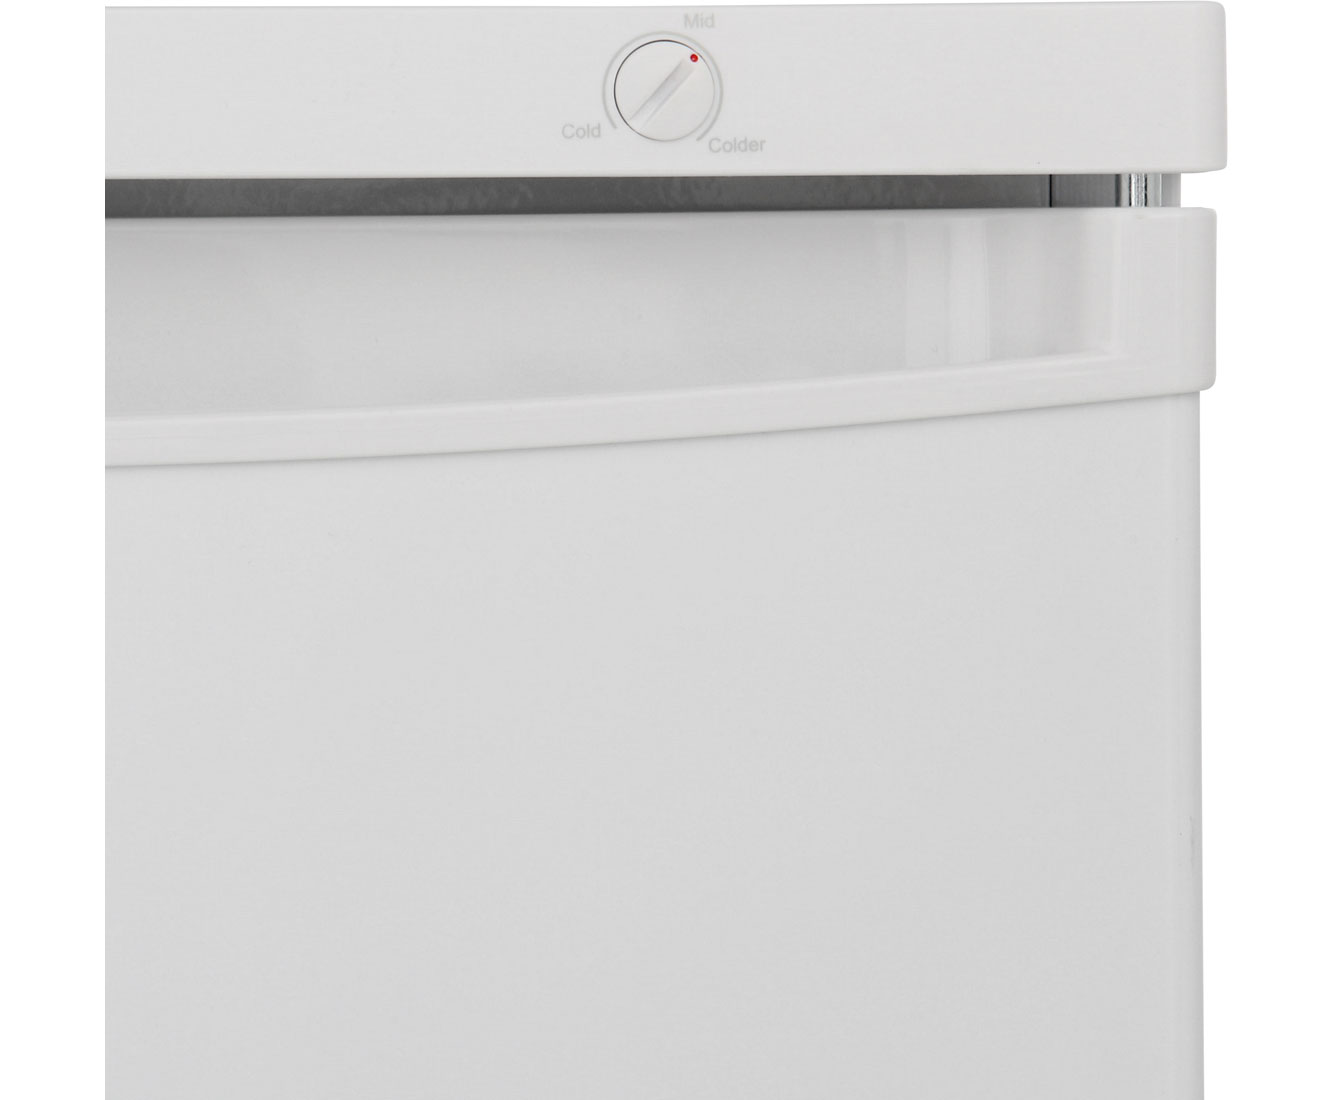 Bomann GS 2186 Gefrierschrank 82 l, Weiß, A++